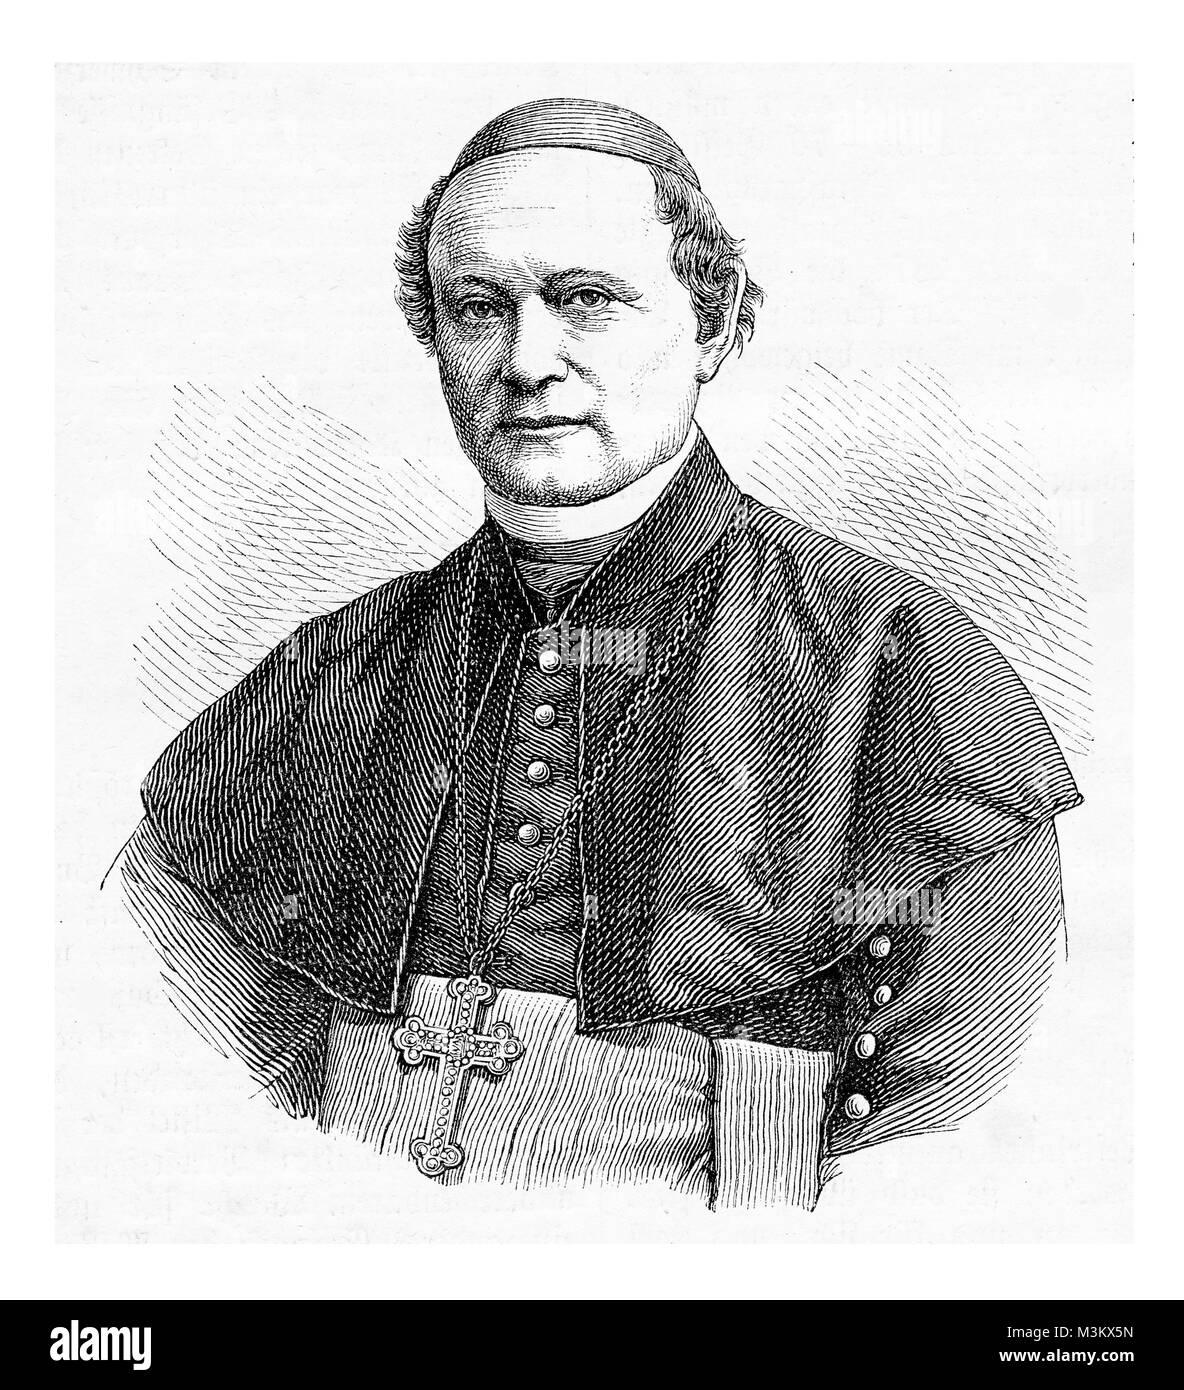 Vintage engraving portrait of Dr. Matthias Eberhard, bishop of Trier - Stock Image